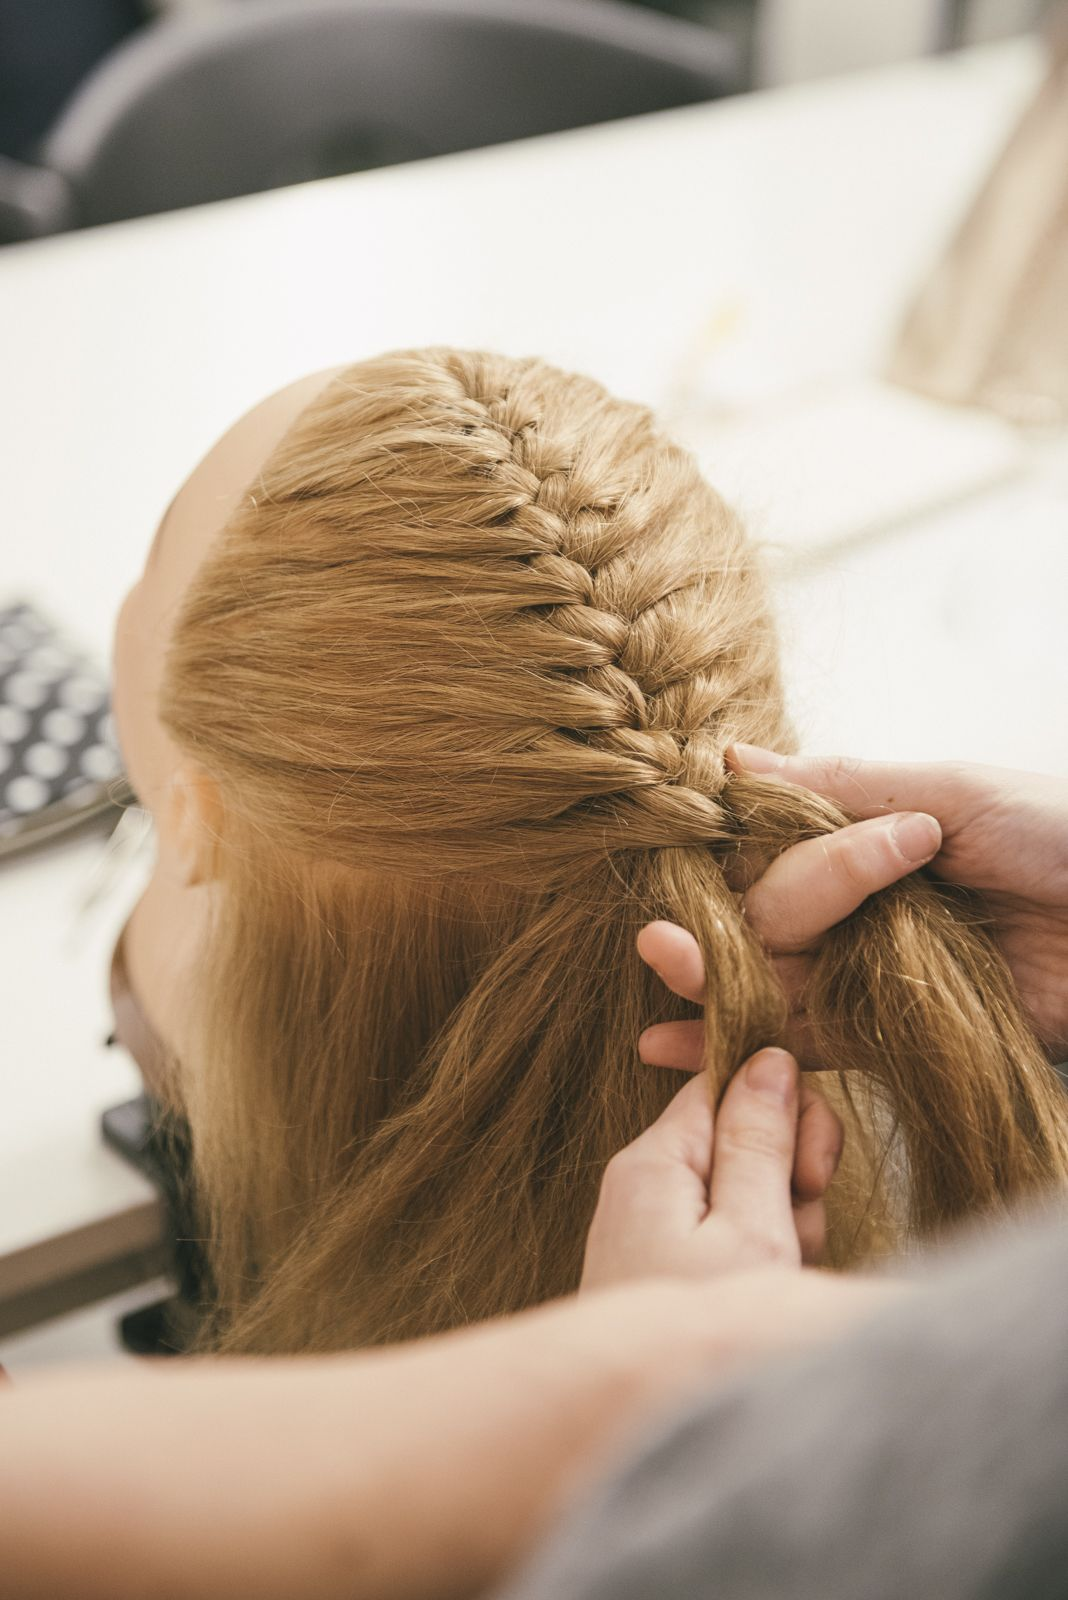 Pin Van Jo Vandevelde Op Hair Mode Kapsels Mannenkapsels Haarkleur